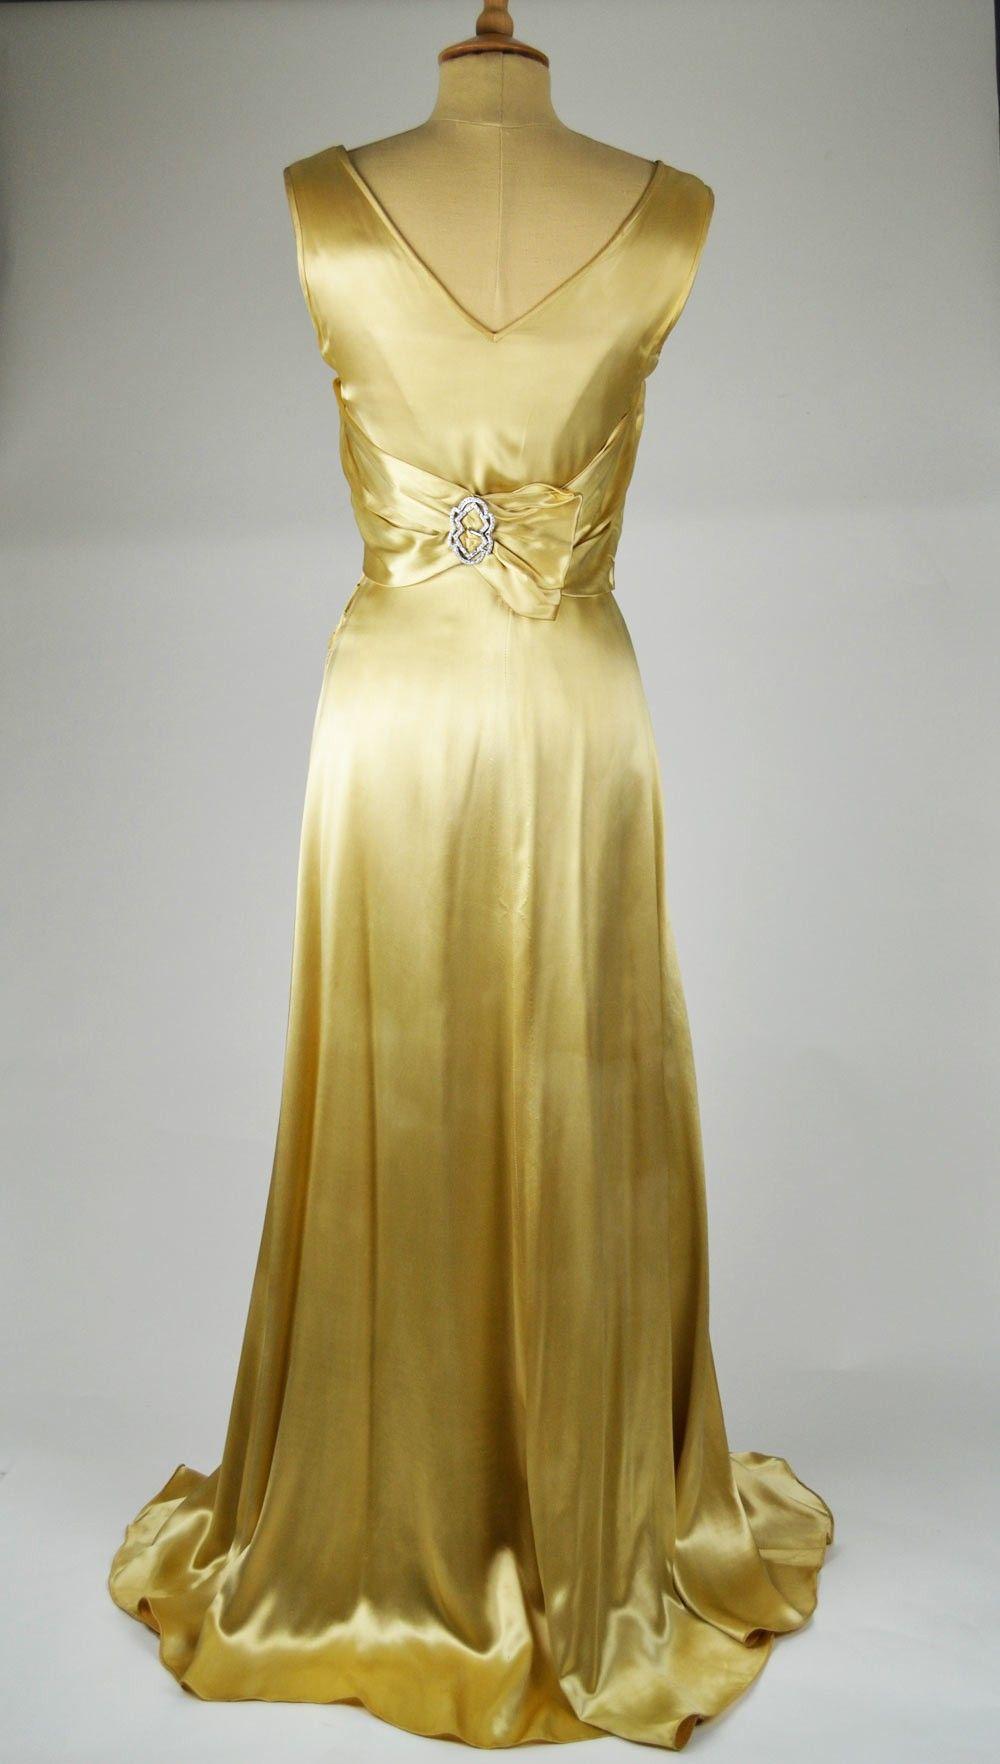 At Mela Vintage We Source Original Wedding Dresses To Our South West London Shop